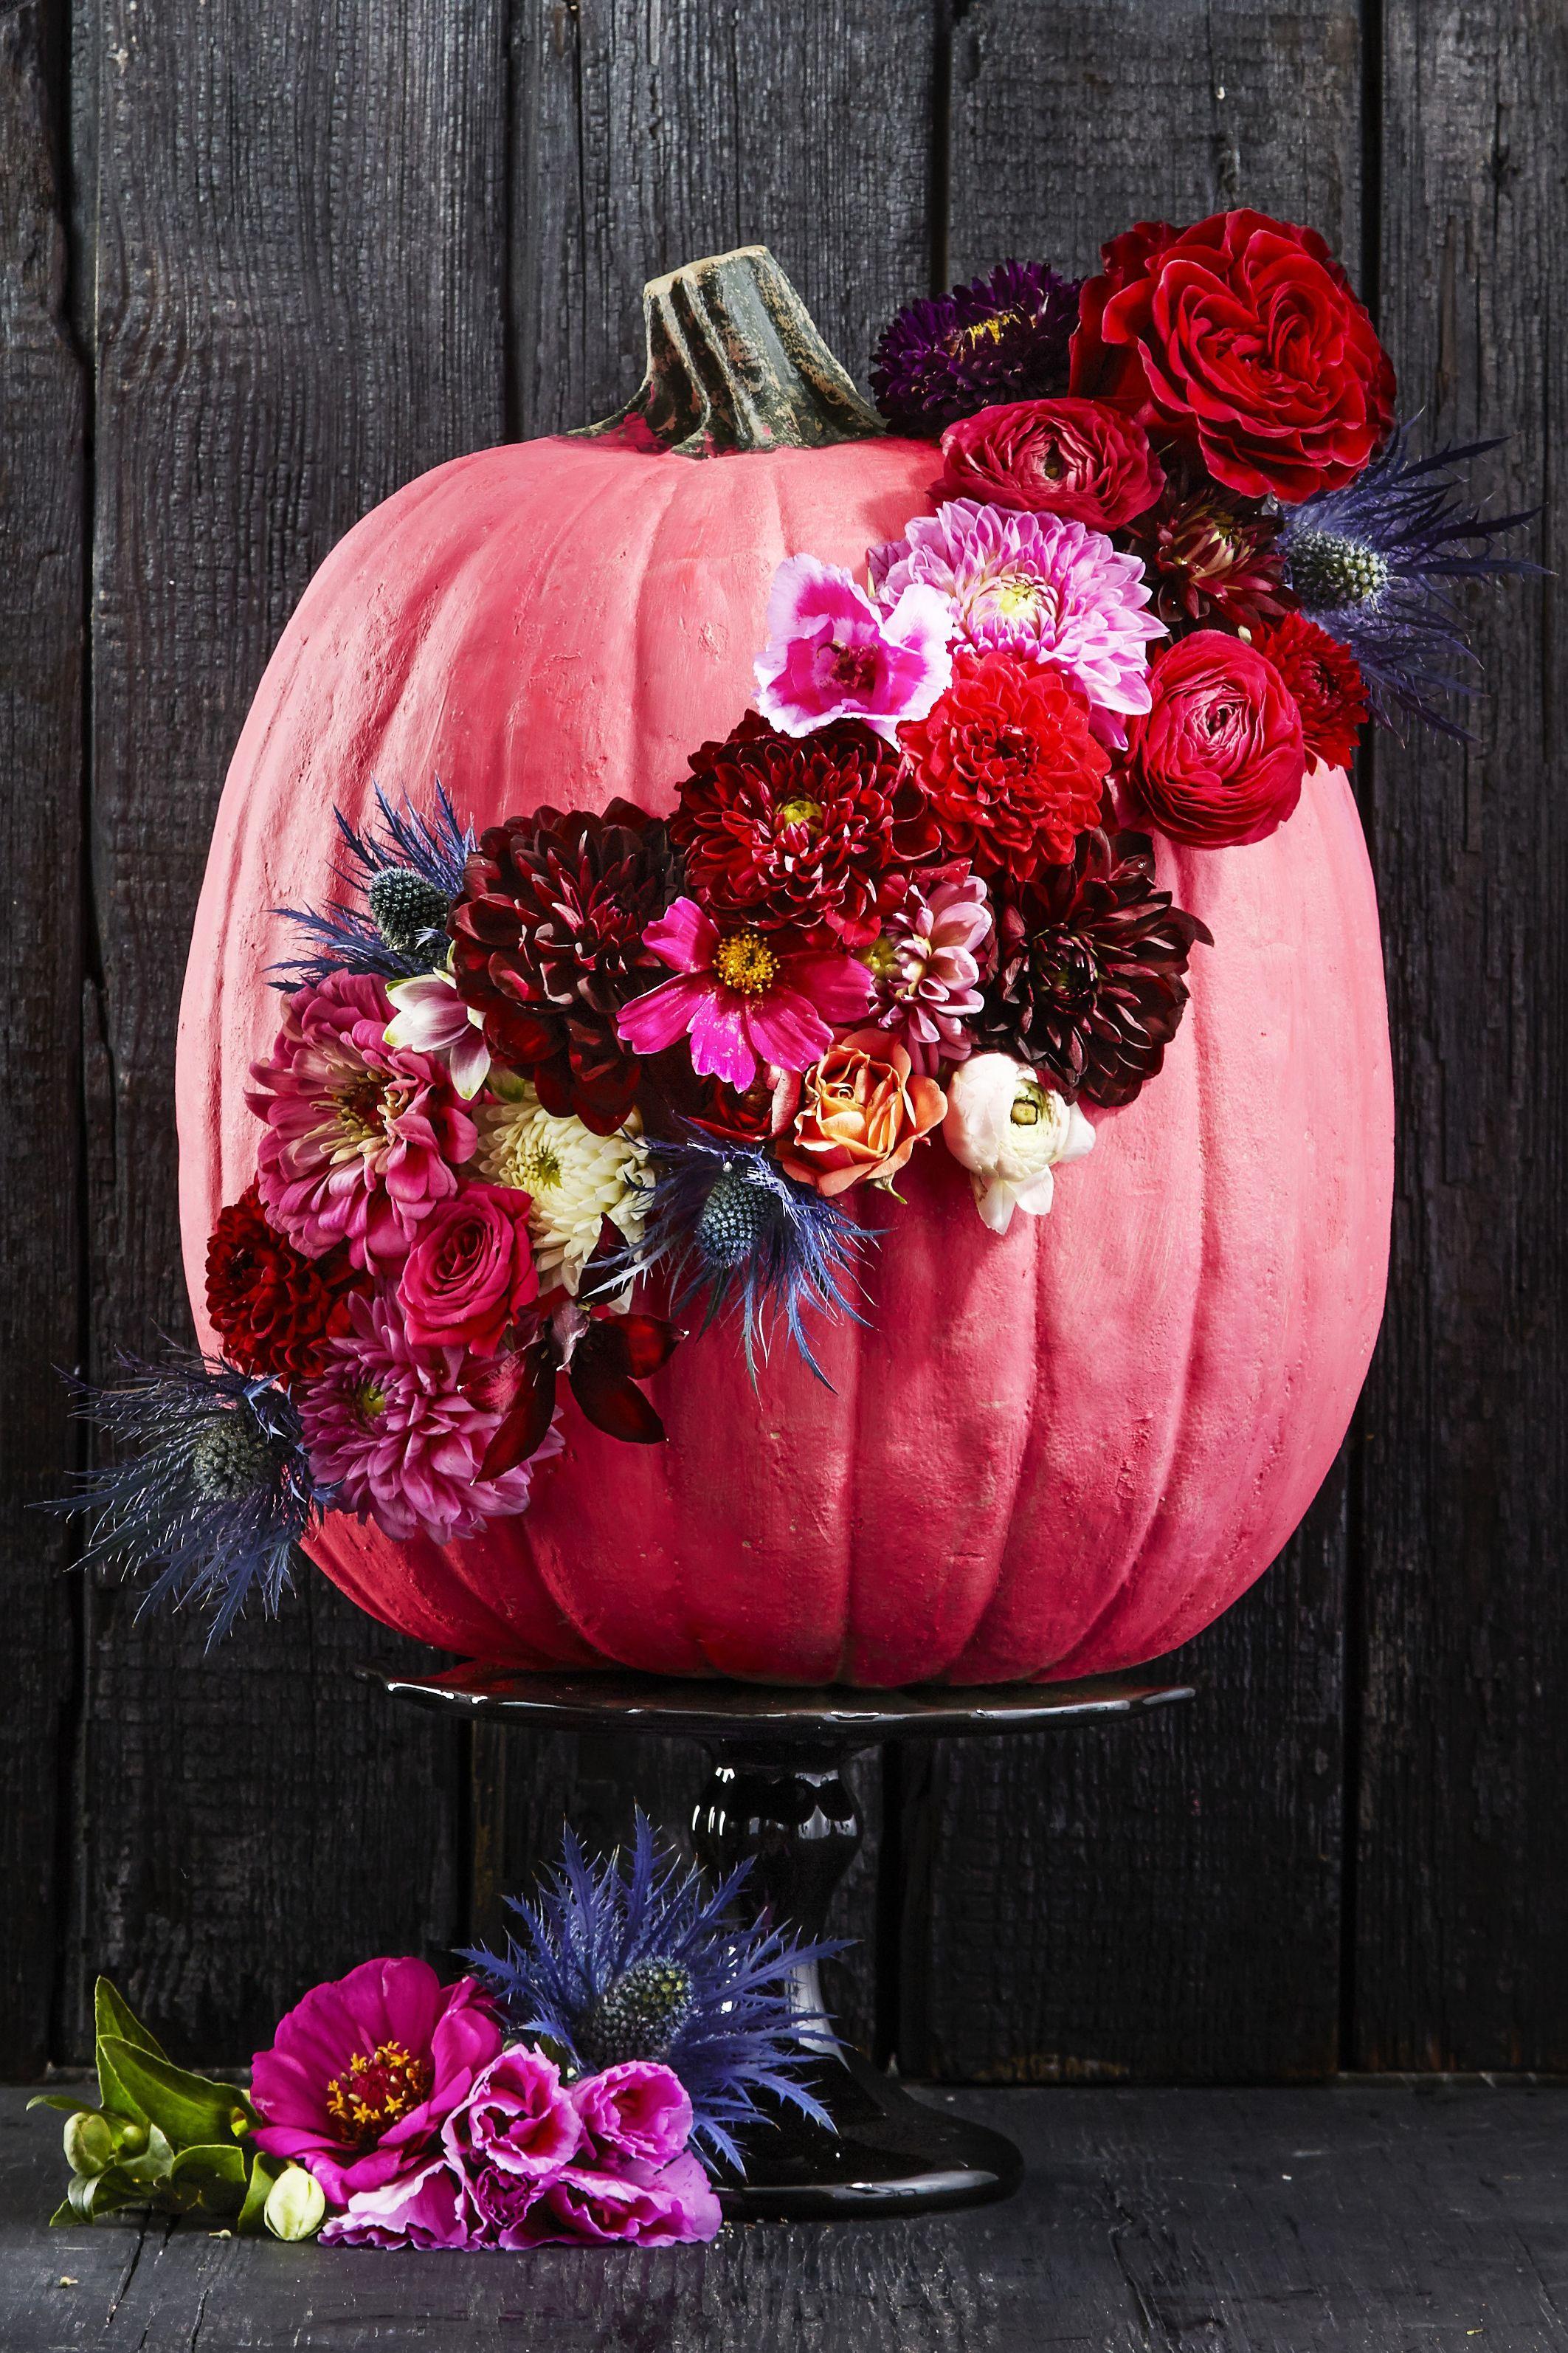 60 Pumpkin Designs We Love For 2018 Pumpkin Decorating Ideas